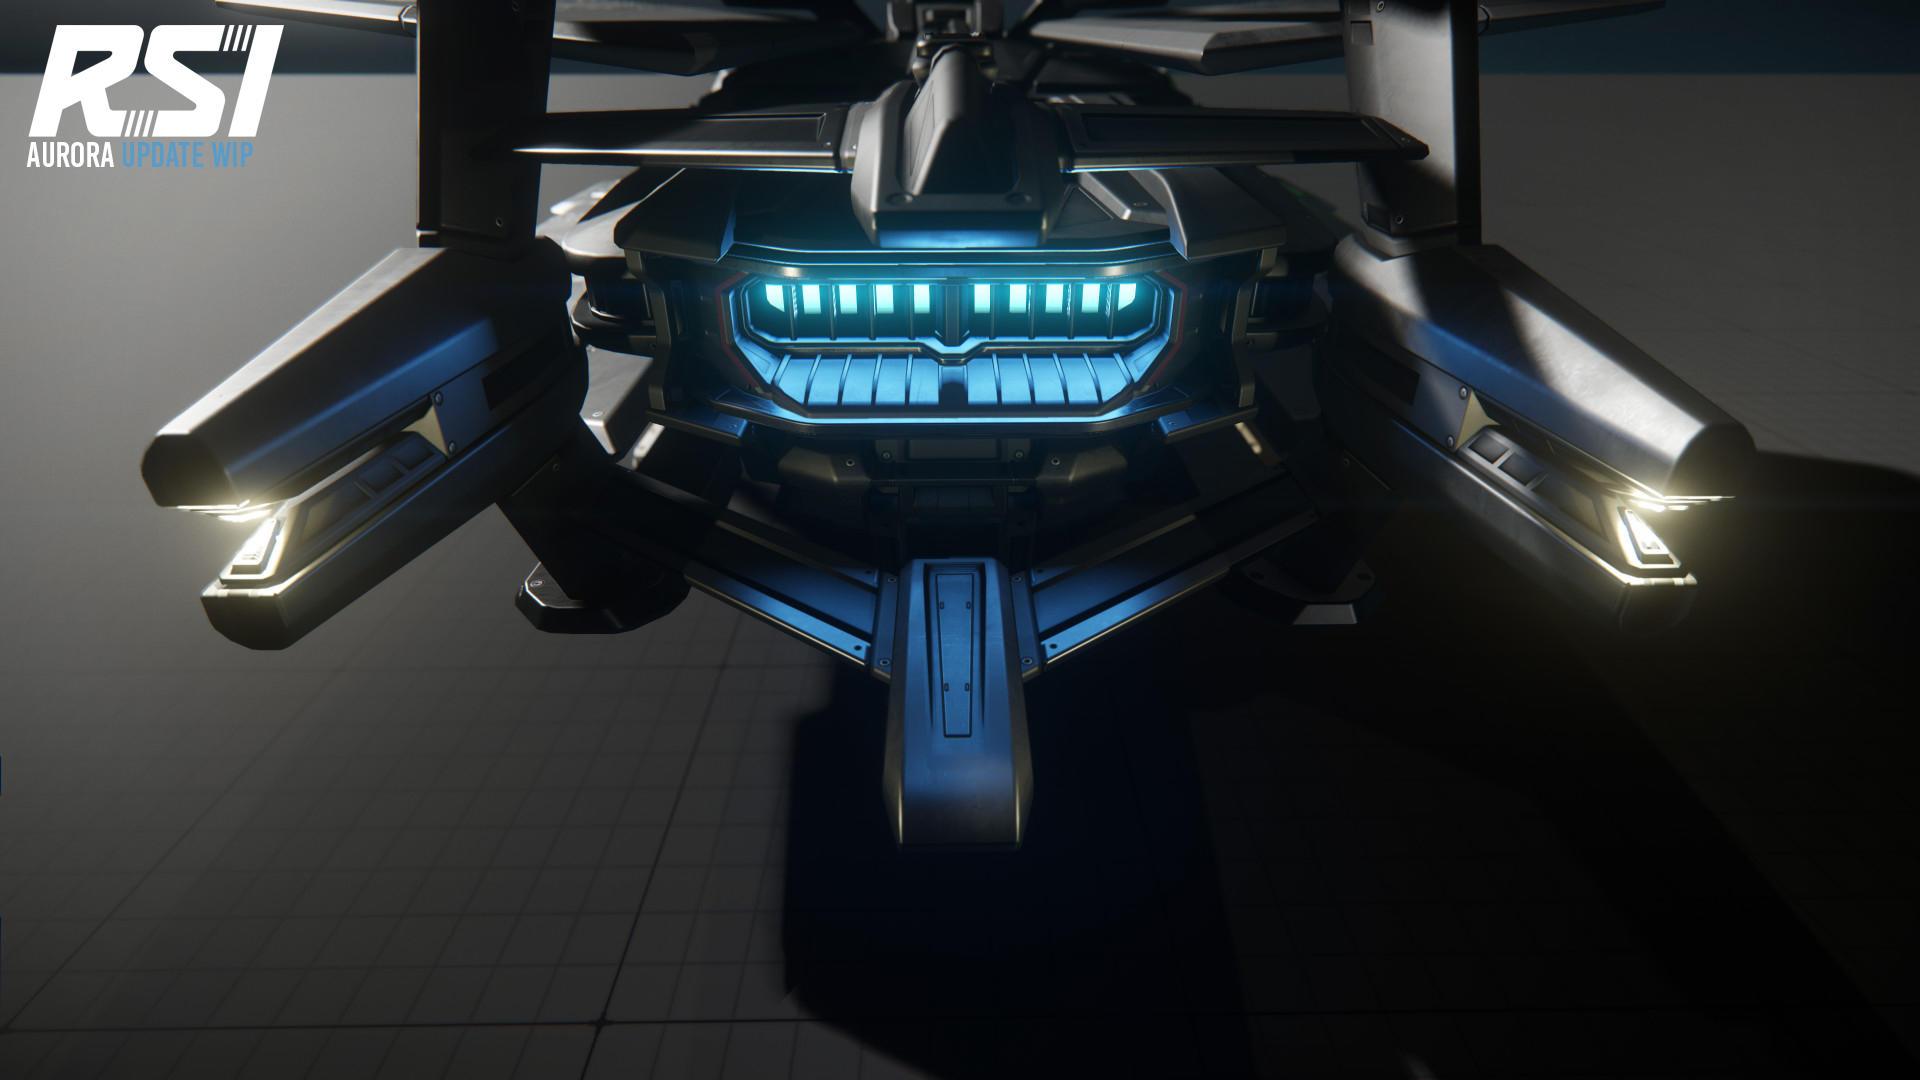 RSI Aurora dysza silnika